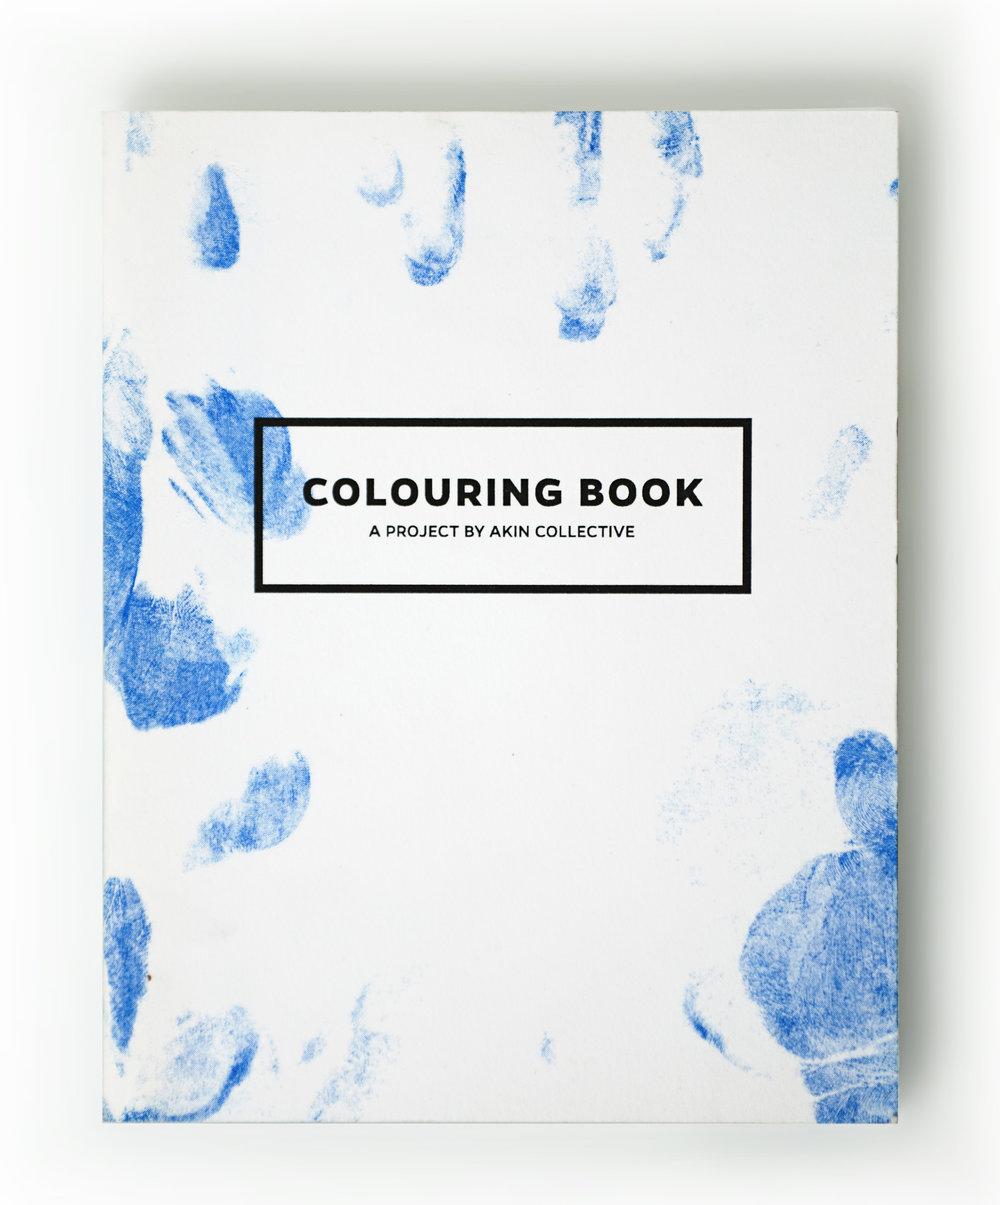 colouring1_2.jpg